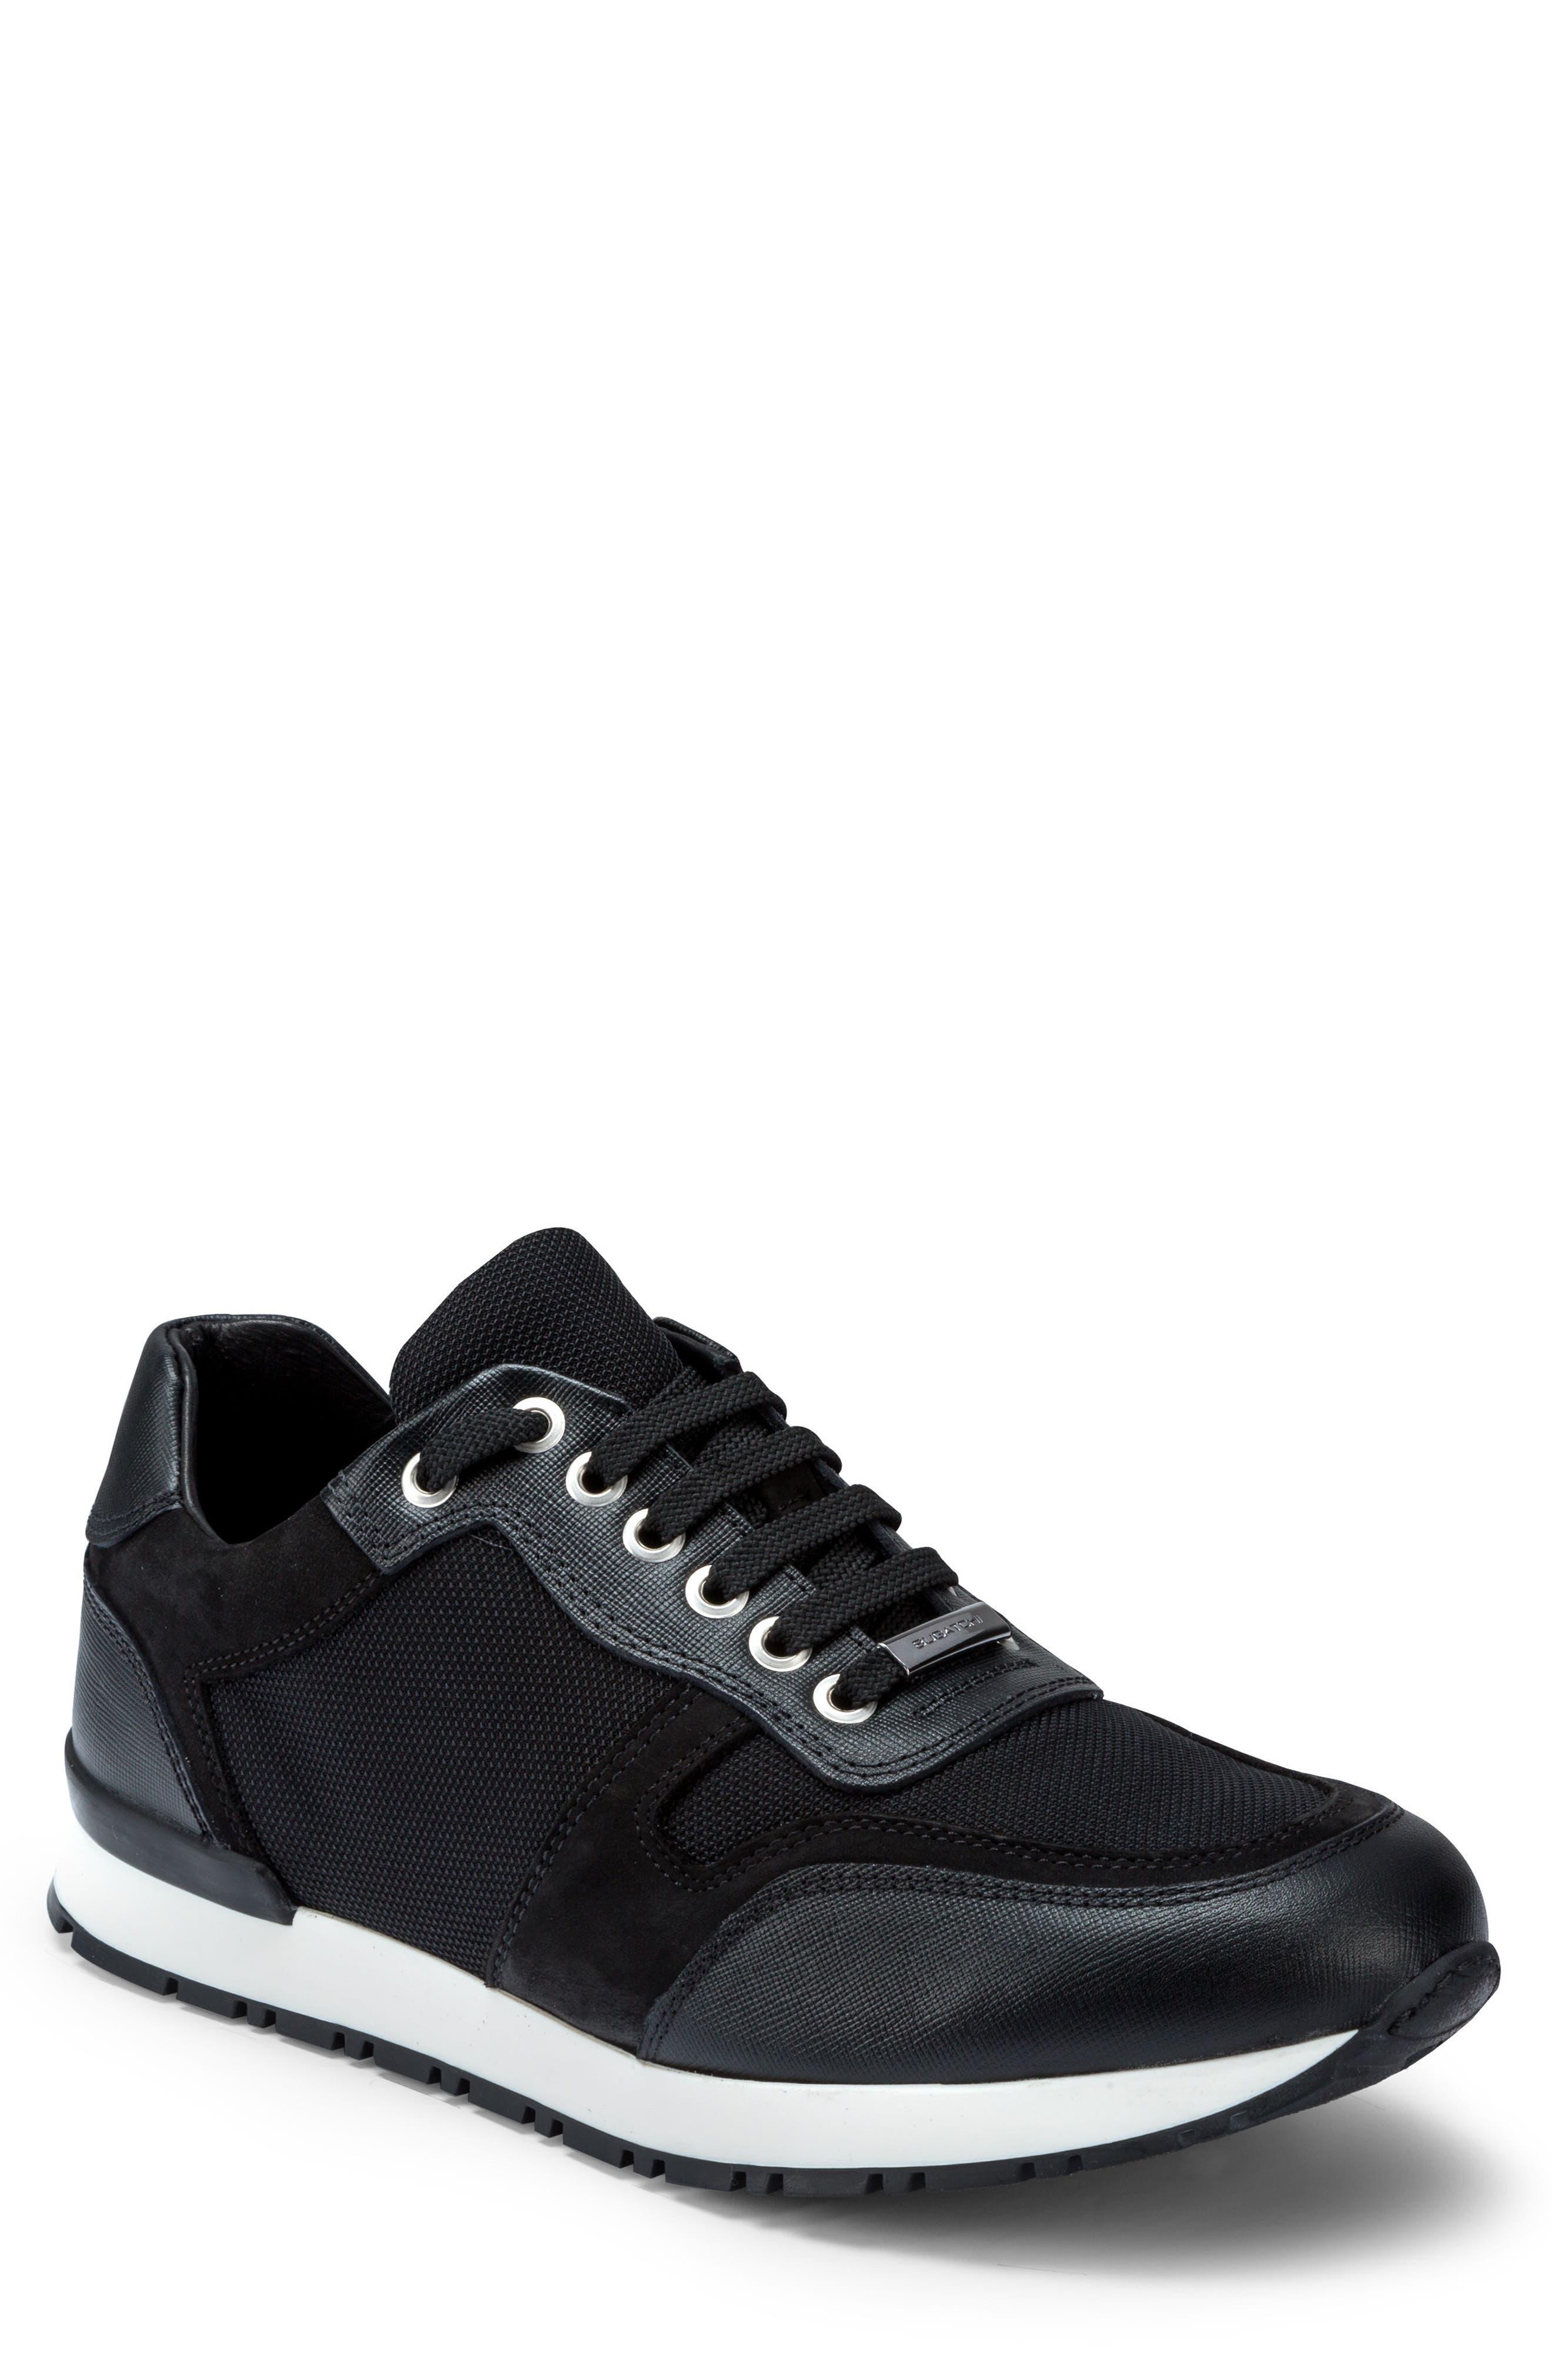 Modena Sneaker,                             Main thumbnail 1, color,                             Nero